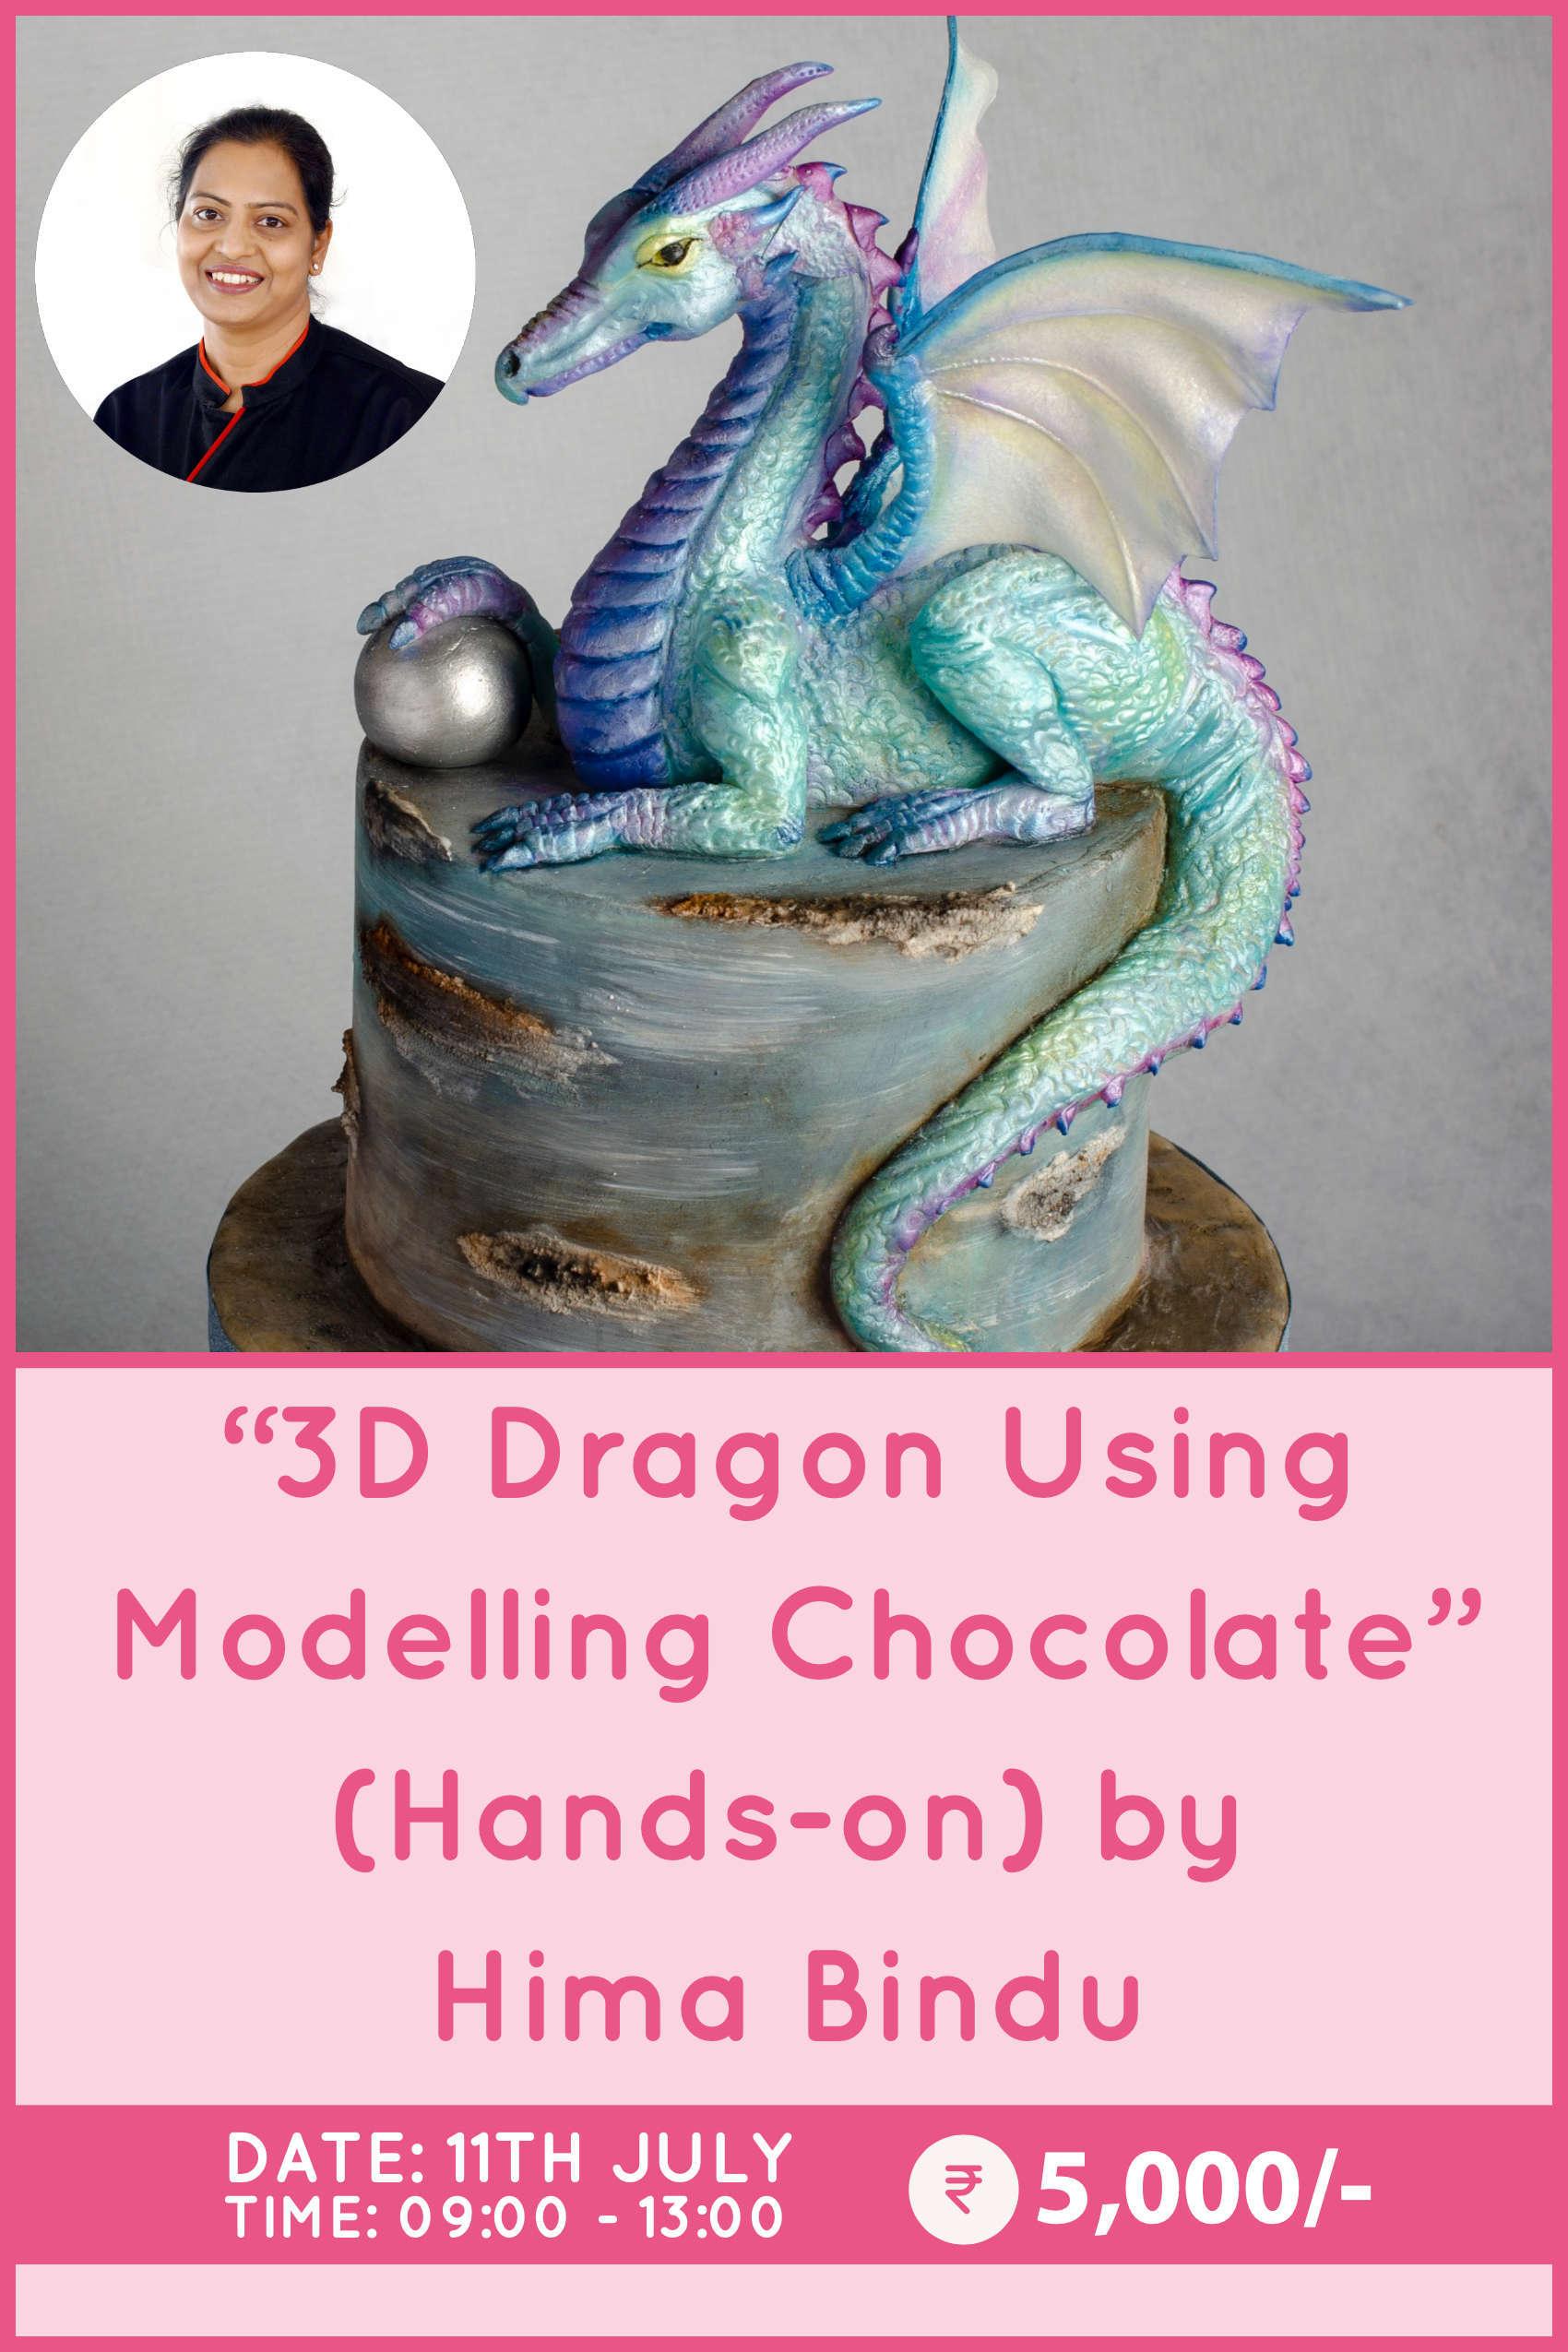 3D Dragon using Modelling Chocolate by Hima Bindu